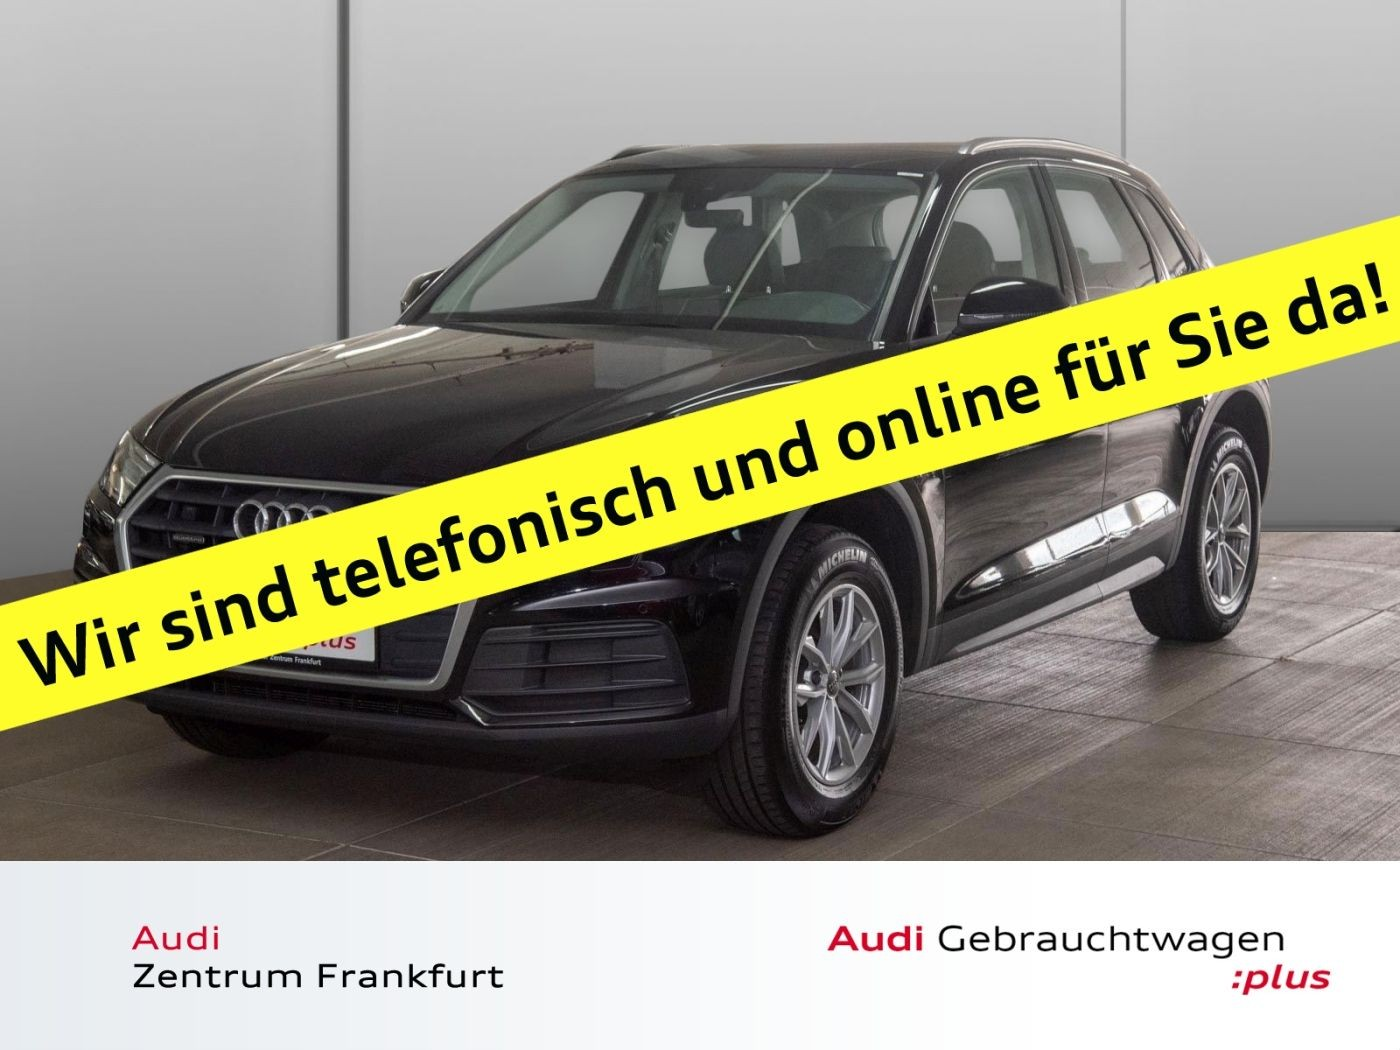 Audi Q5 2.0 TDI quattro S tronic Navi Xenon Sitzheizung PDC, Jahr 2017, Diesel